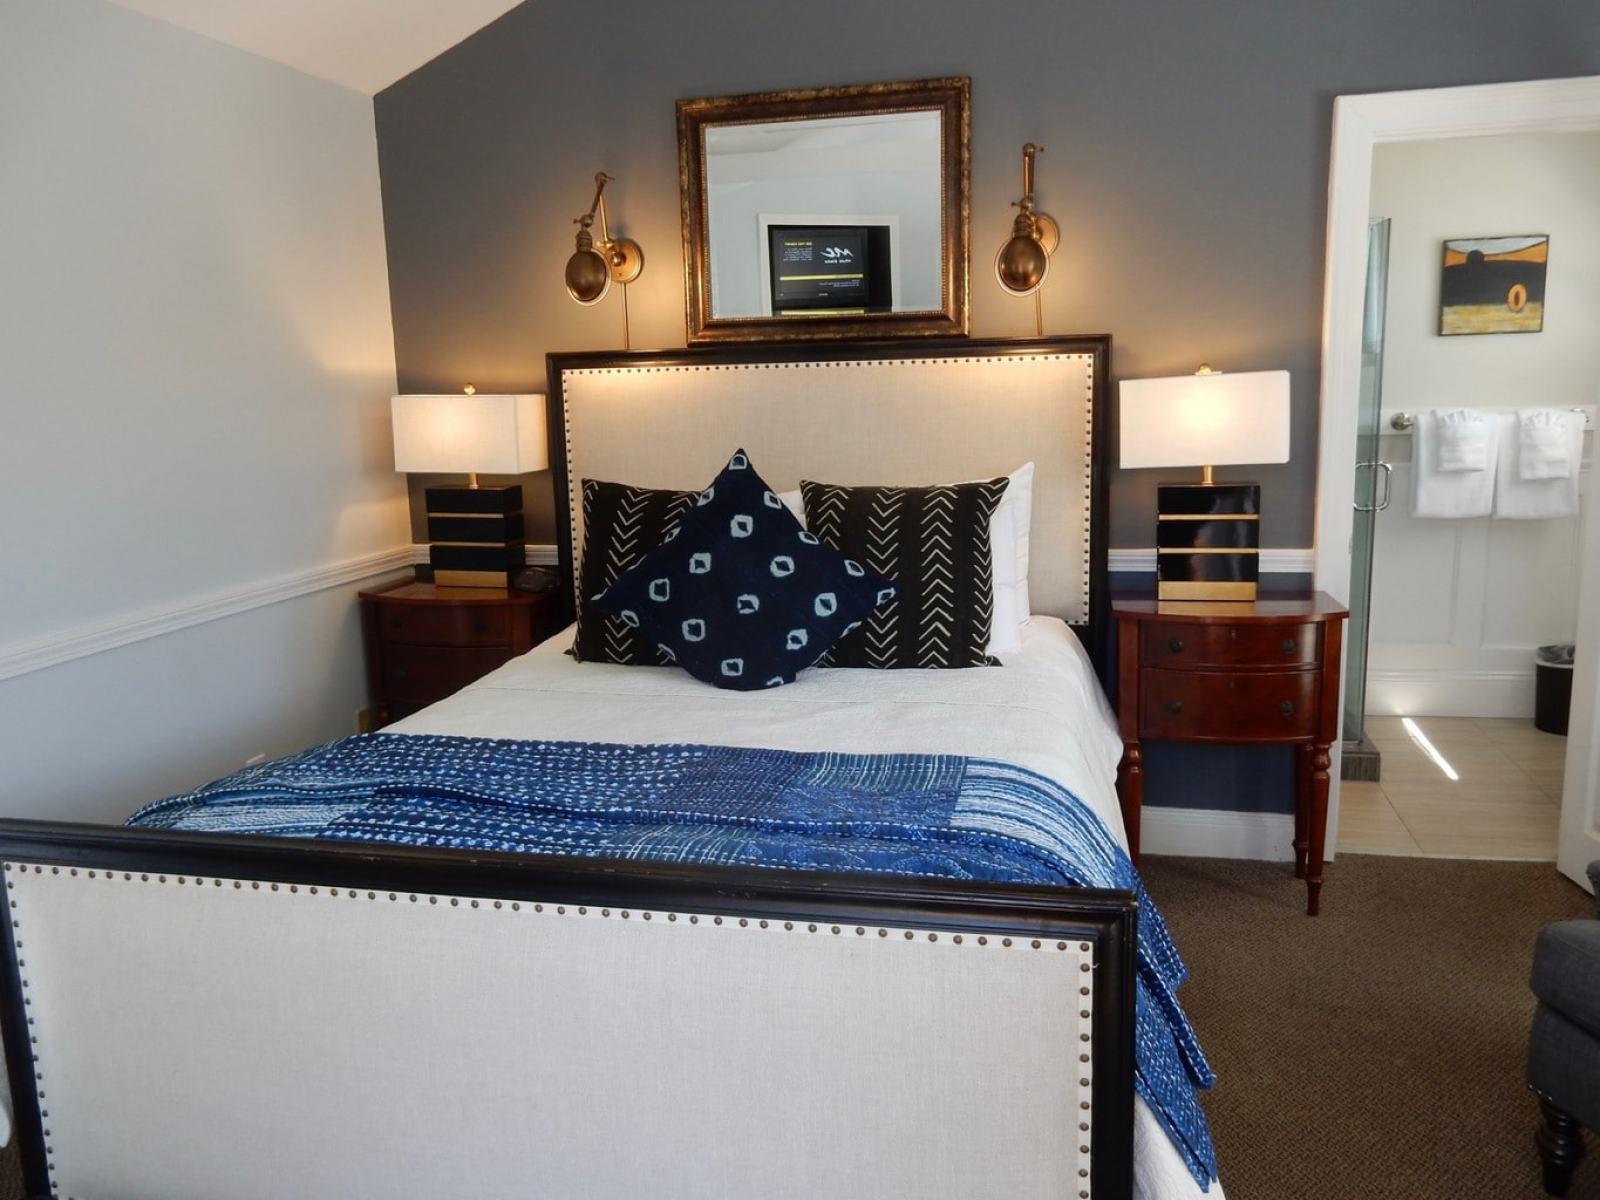 Guest Room, Carpe Diem Guesthouse, Provincetown MA